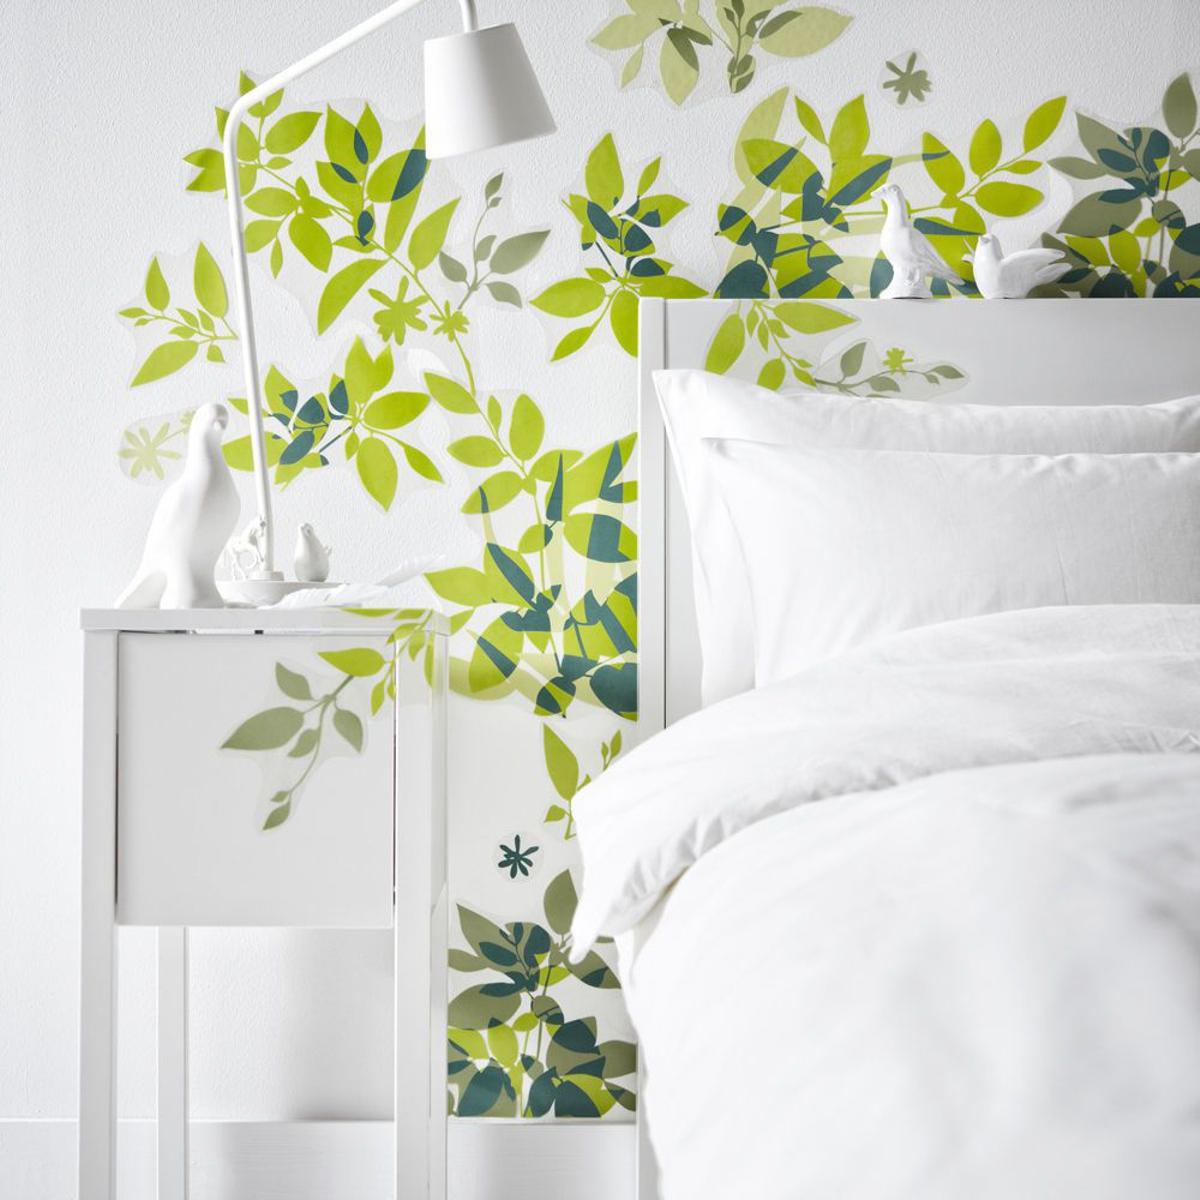 vinilos decorativos de Ikea - mod. ELSABO